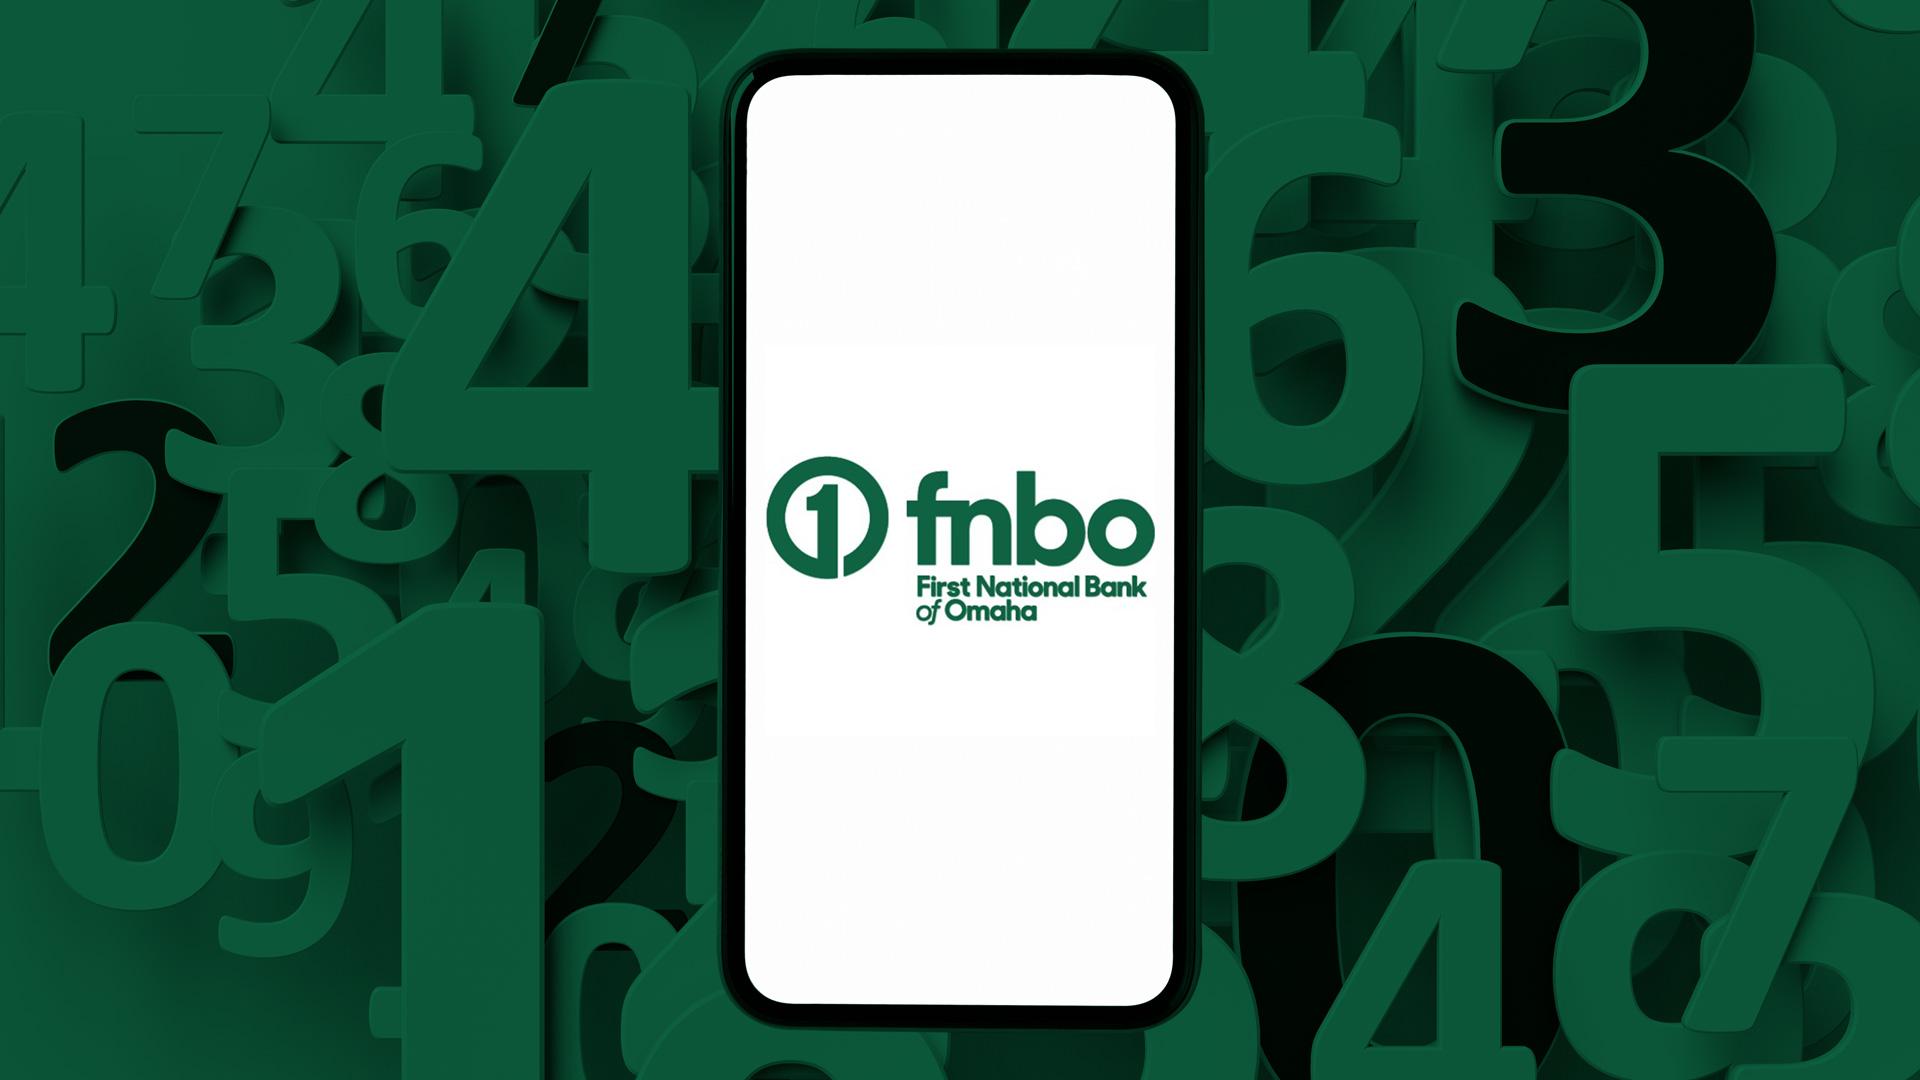 First National Bank of Omaha FNBO